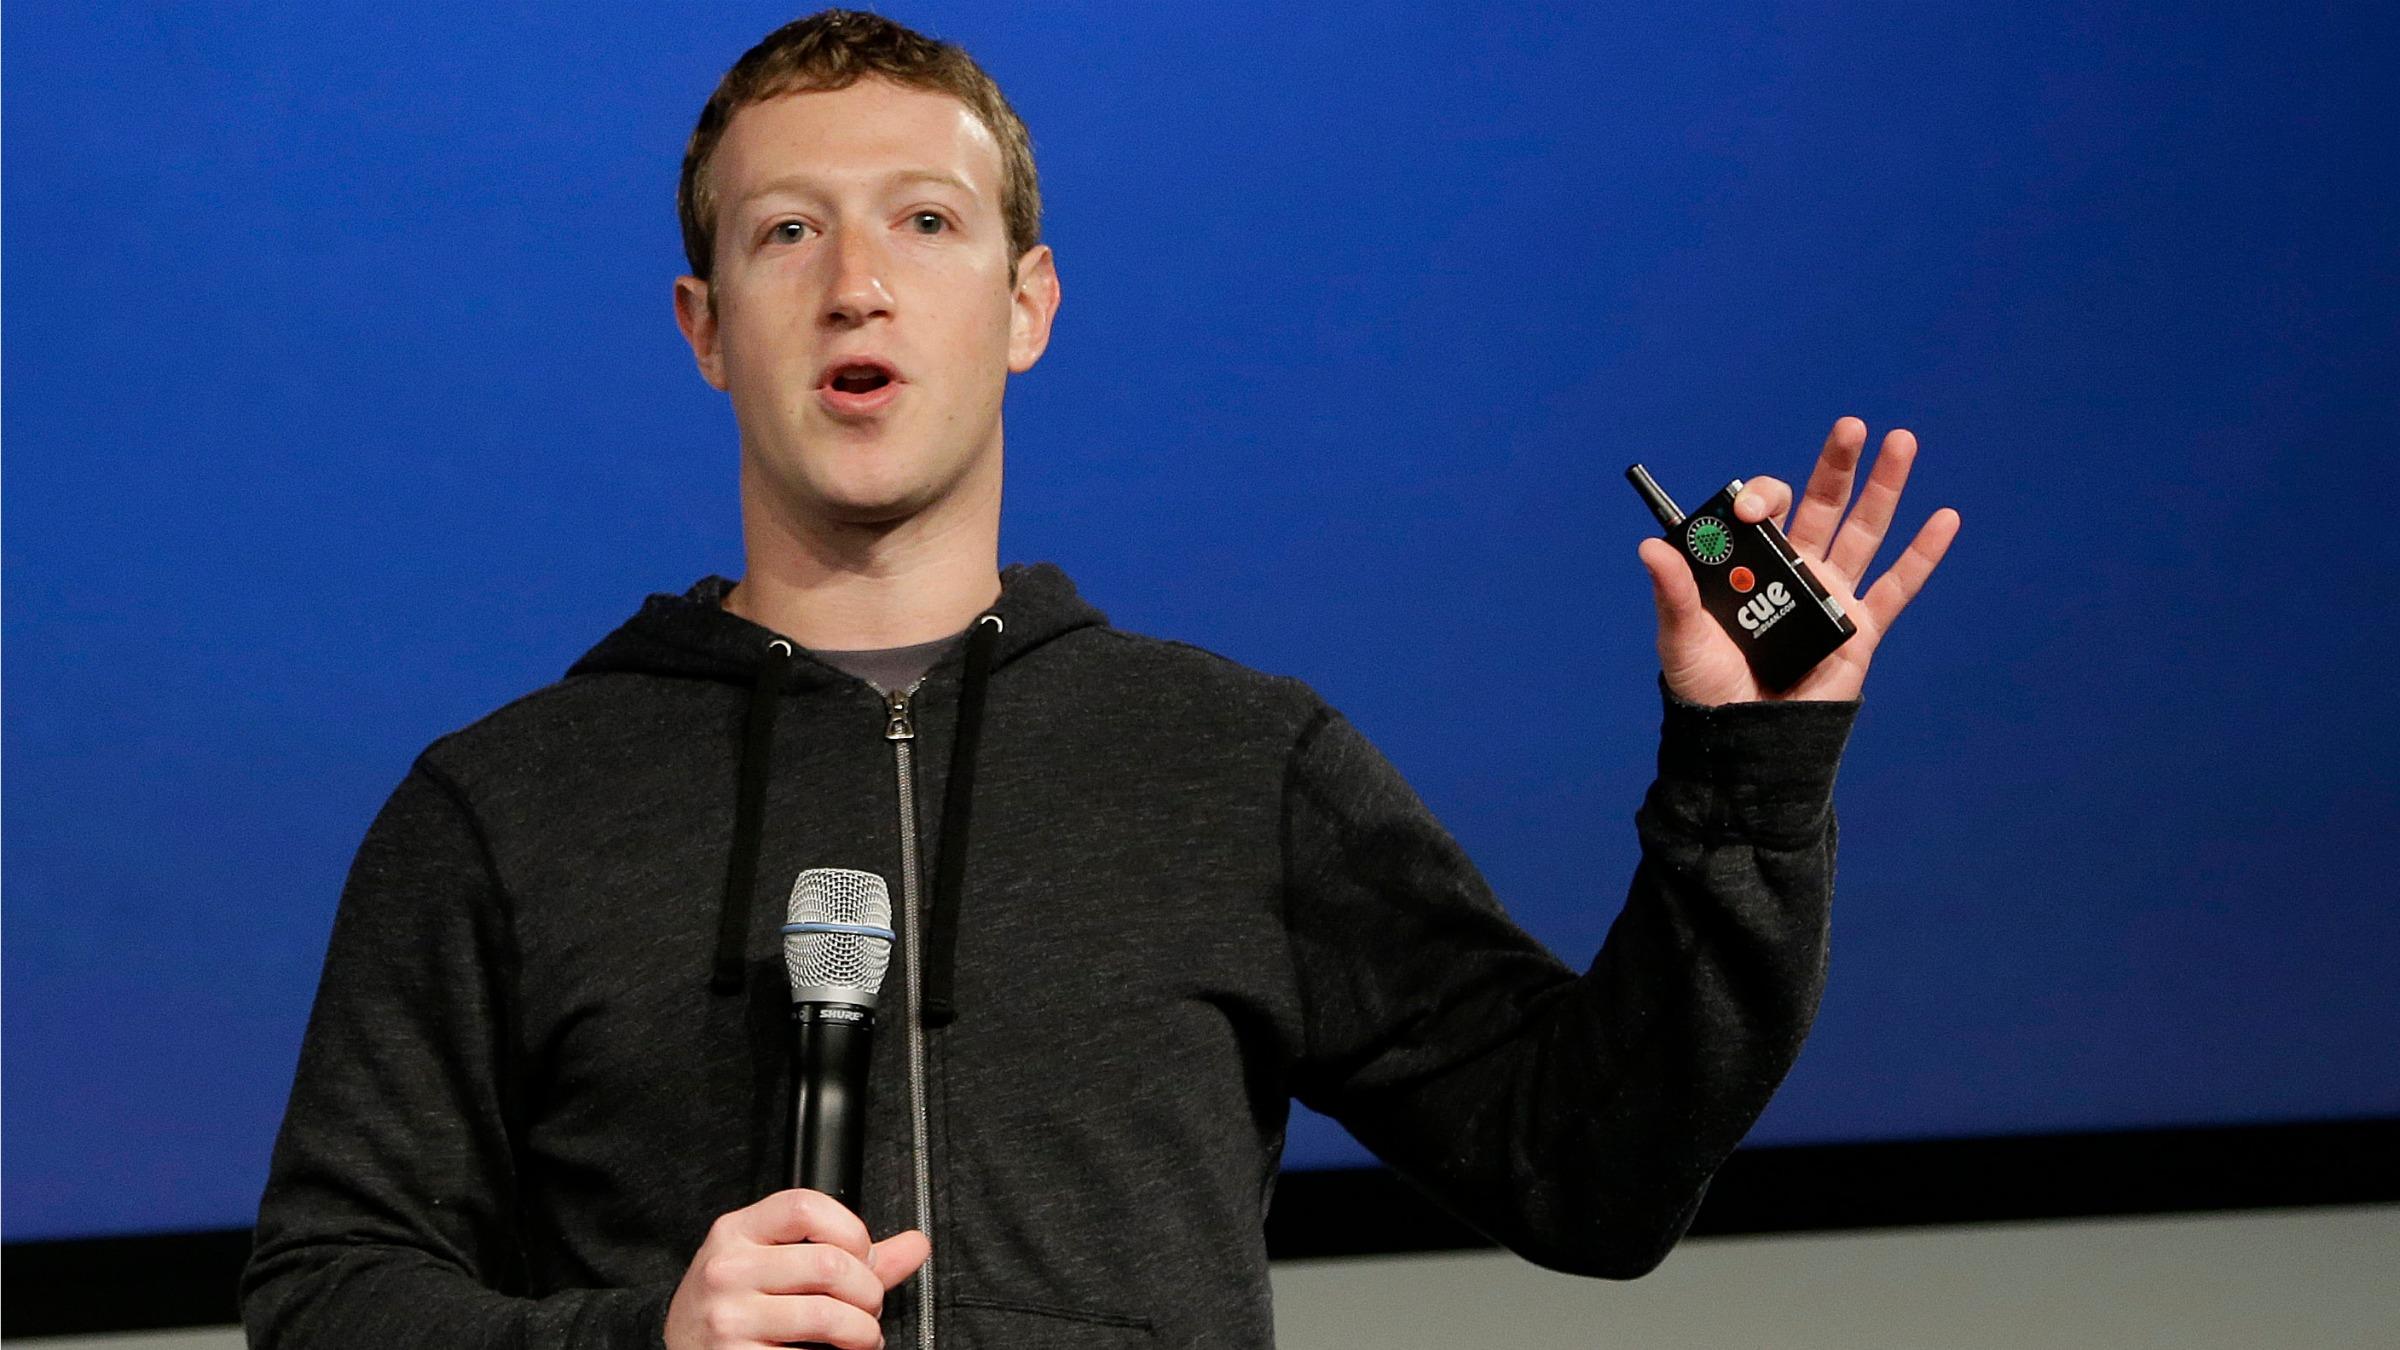 Facebook CEO Mark Zuckerberg speaks at Facebook headquarters in Menlo Park.